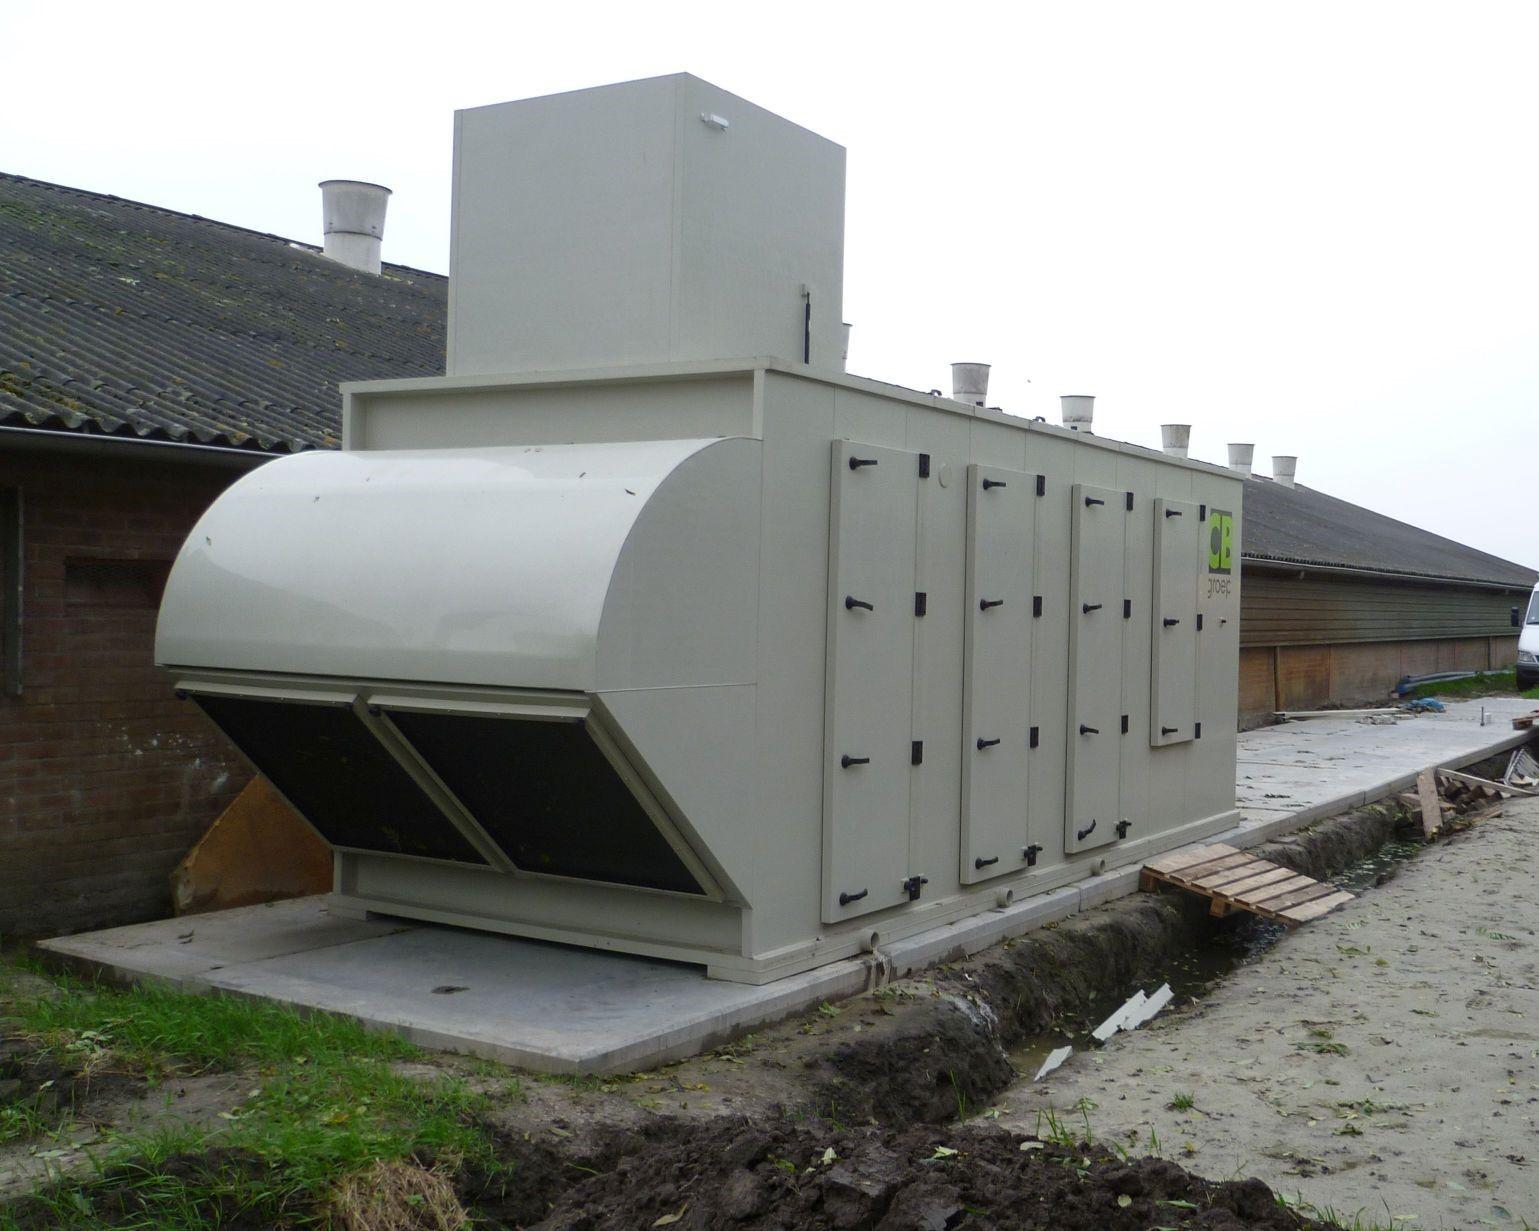 Warmtewisselaar op bestaande kippenstal